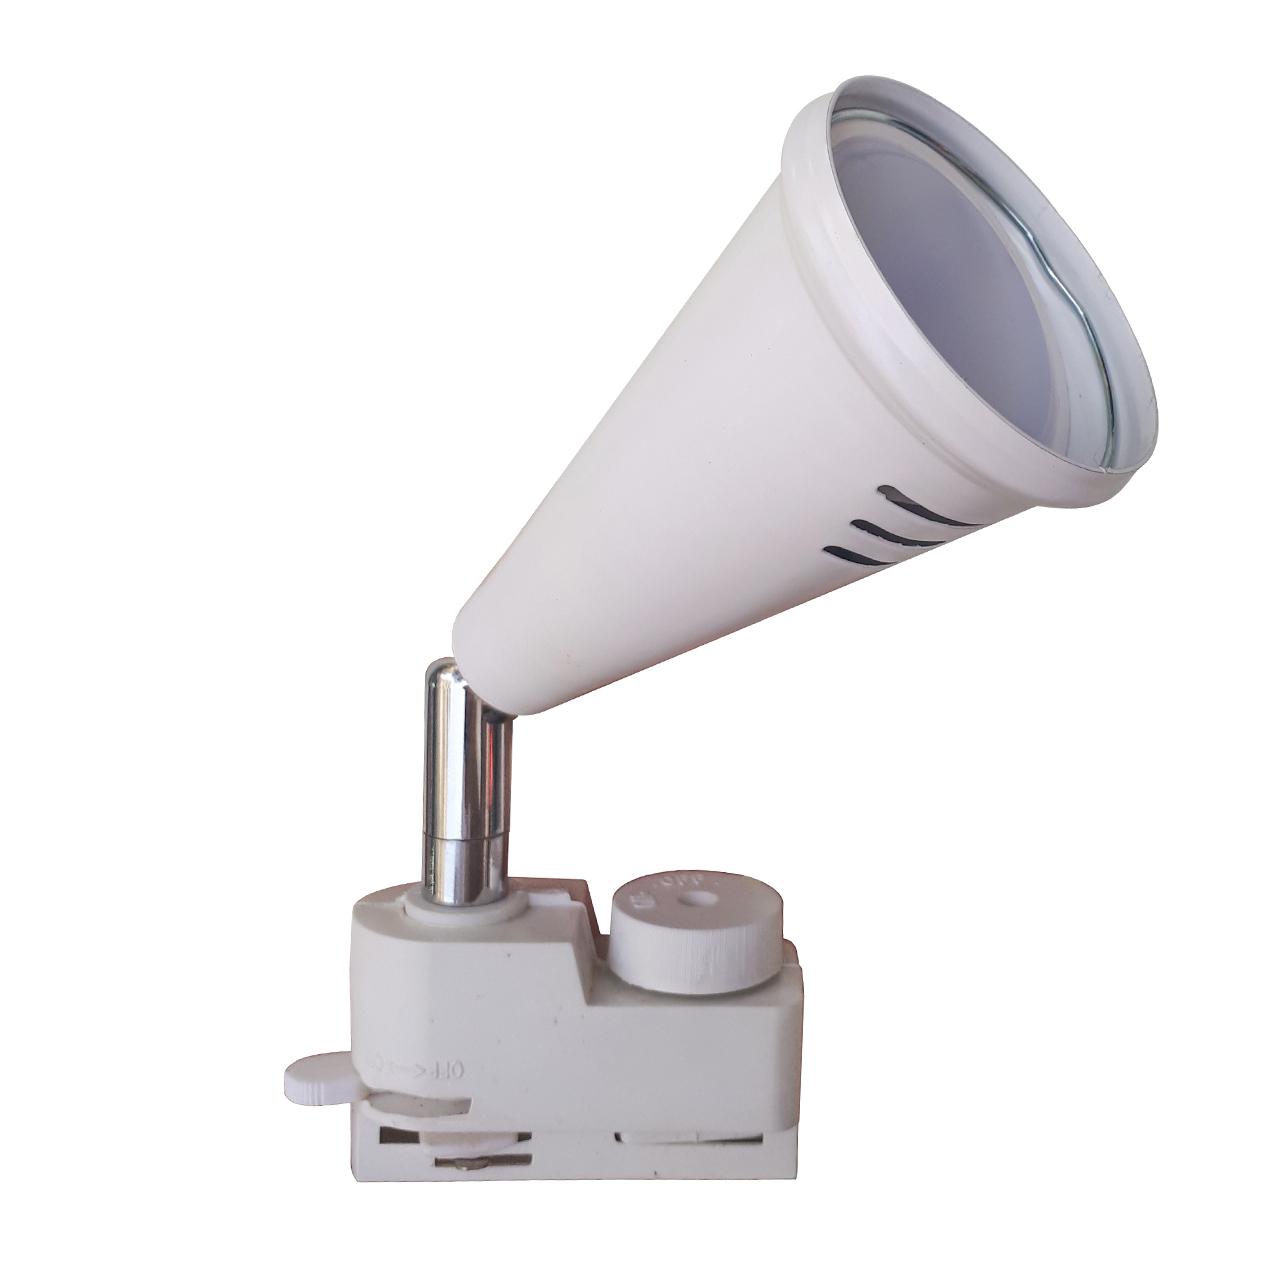 چراغ ریلی مدل A801